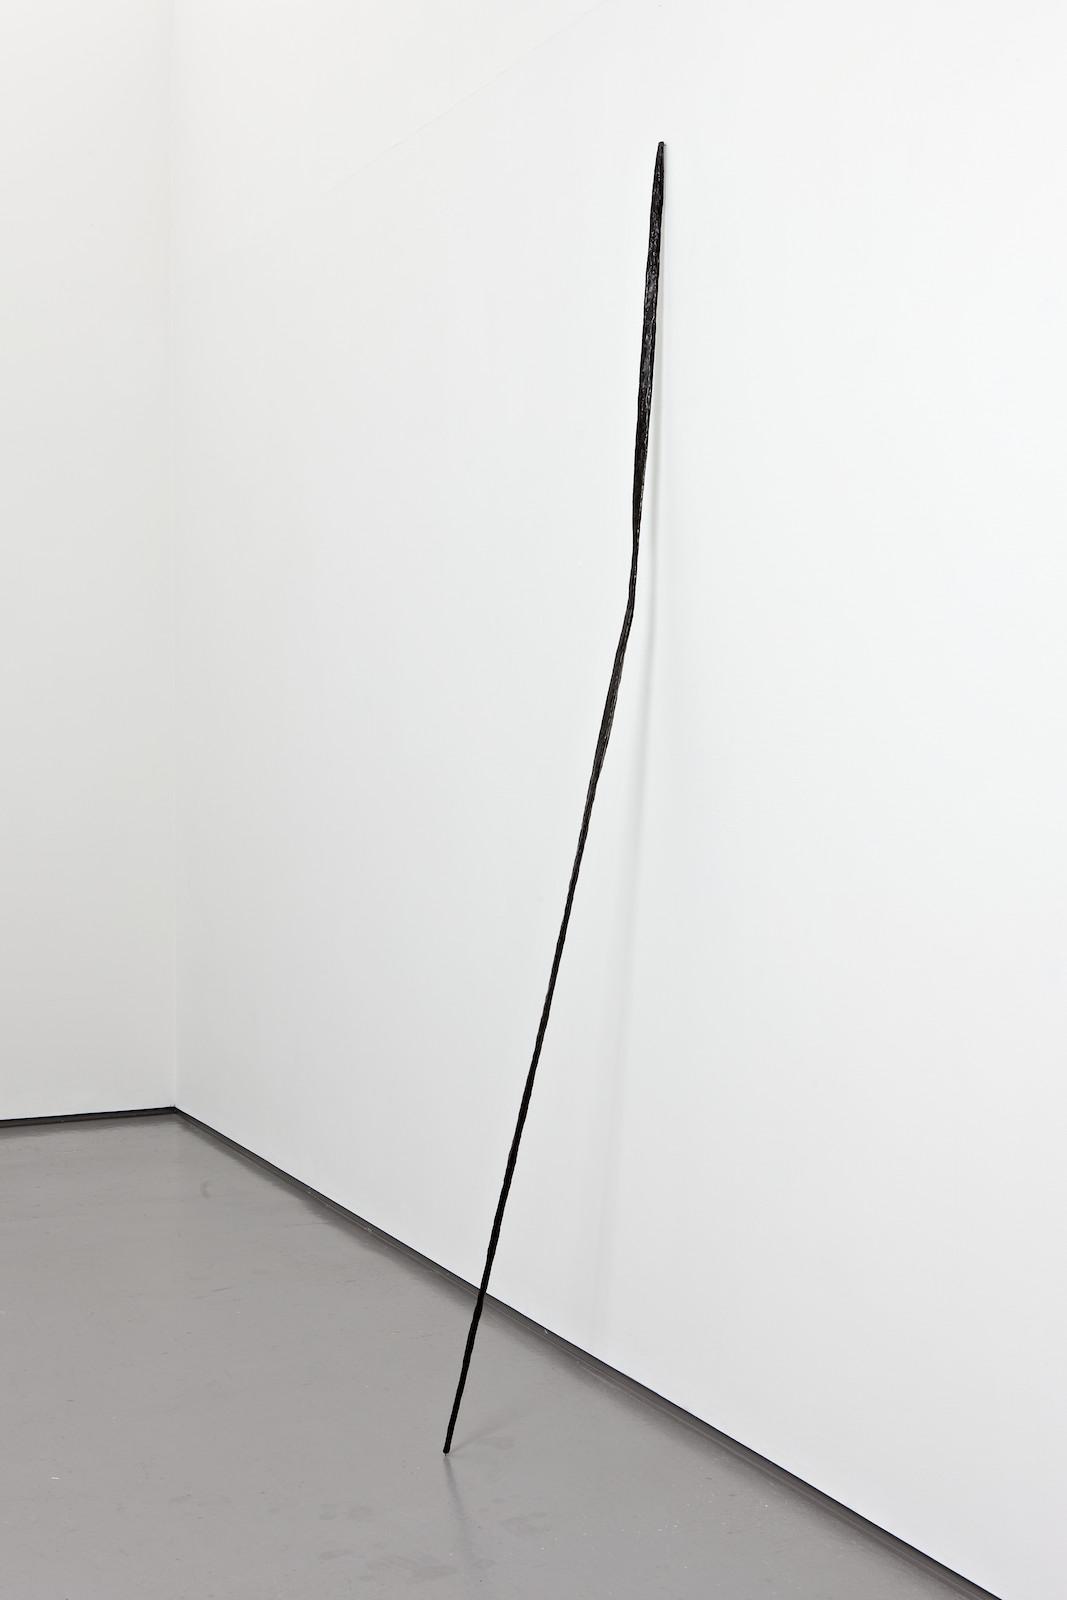 Sculpture V, 2006, bronze, height 213 cm, ed. 6